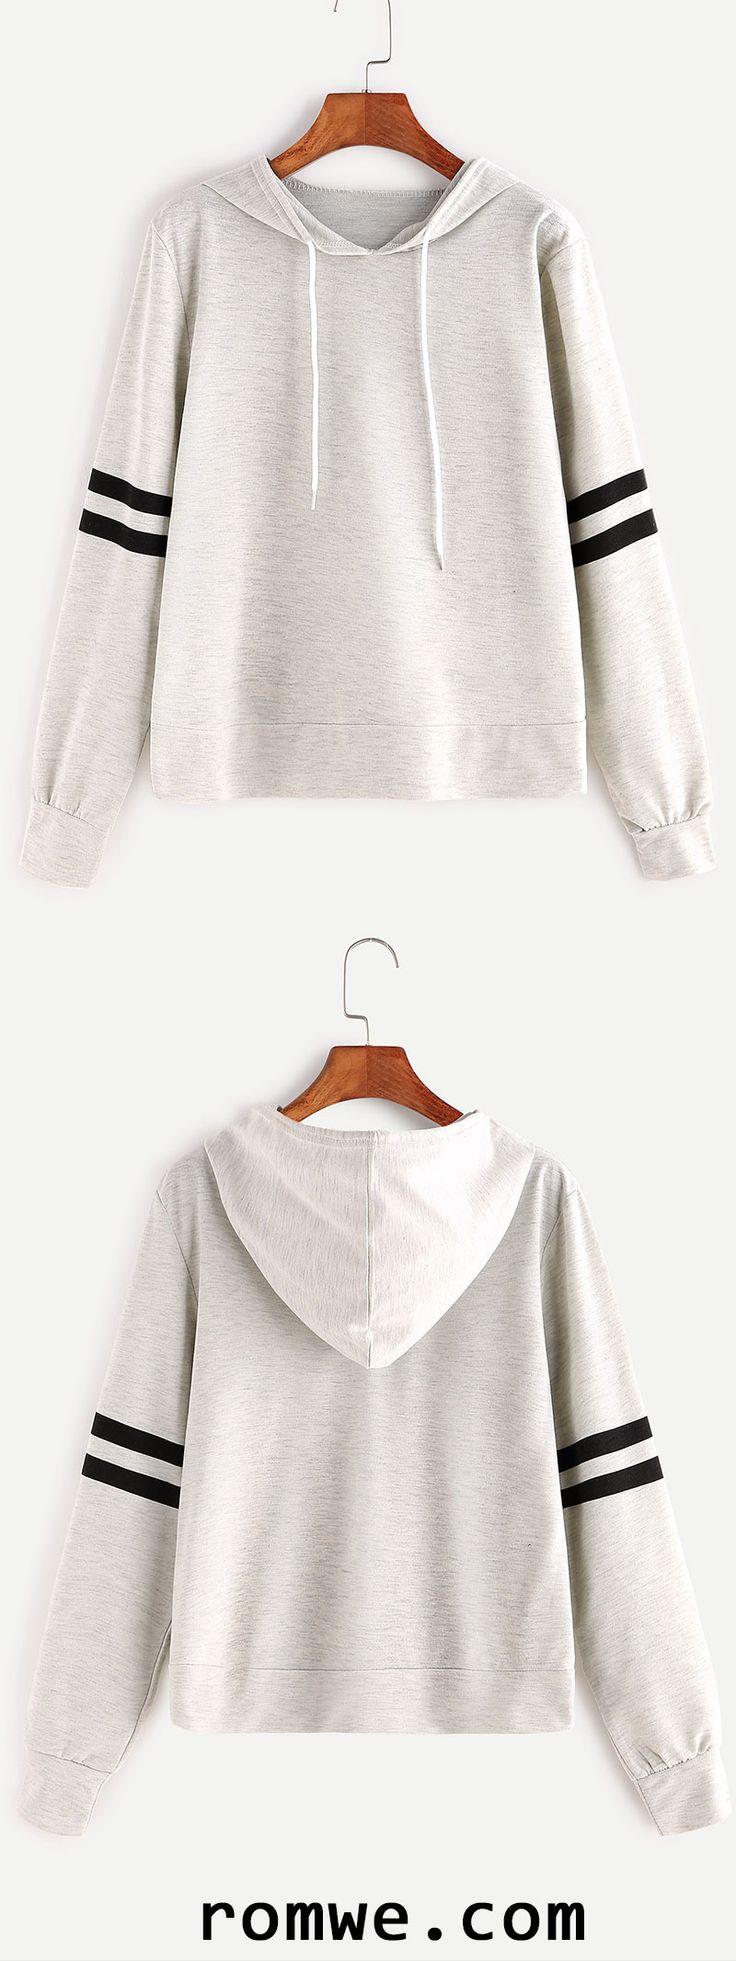 Heather Grey Varsity Striped Drawstring Hooded Sweatshirt